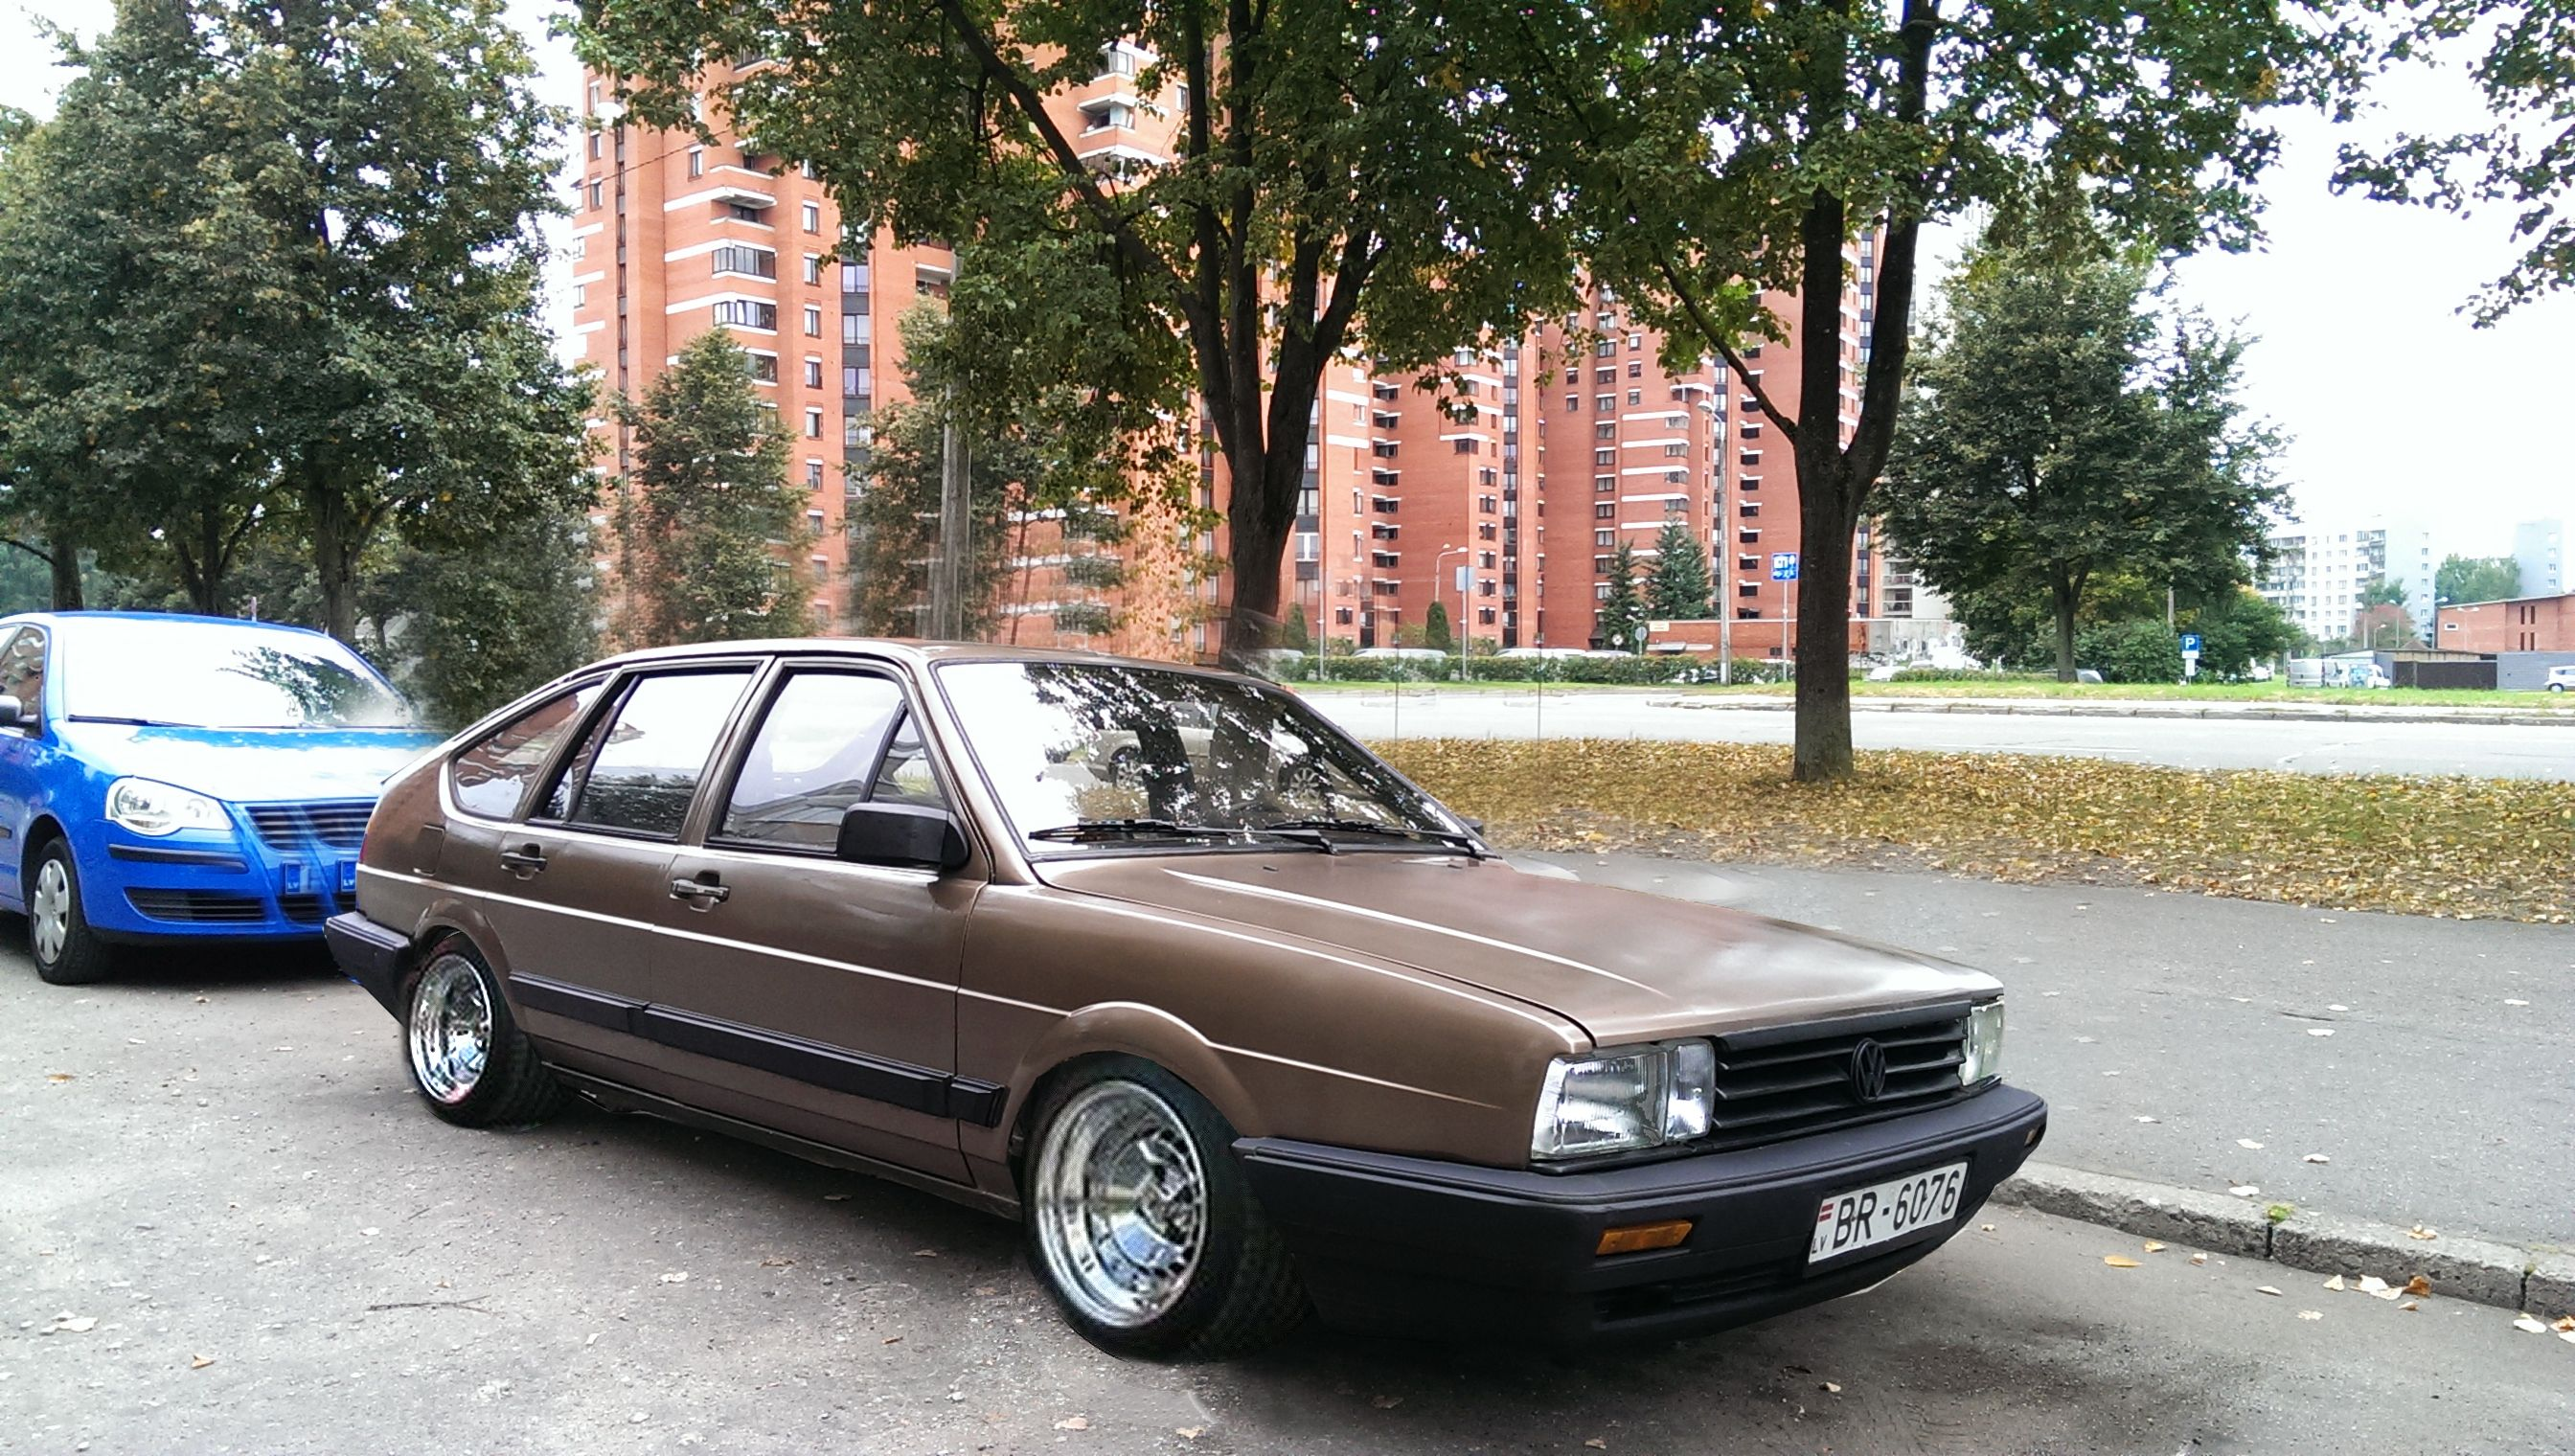 1986 Passat B2 Hatchback. Photoshop concept design.